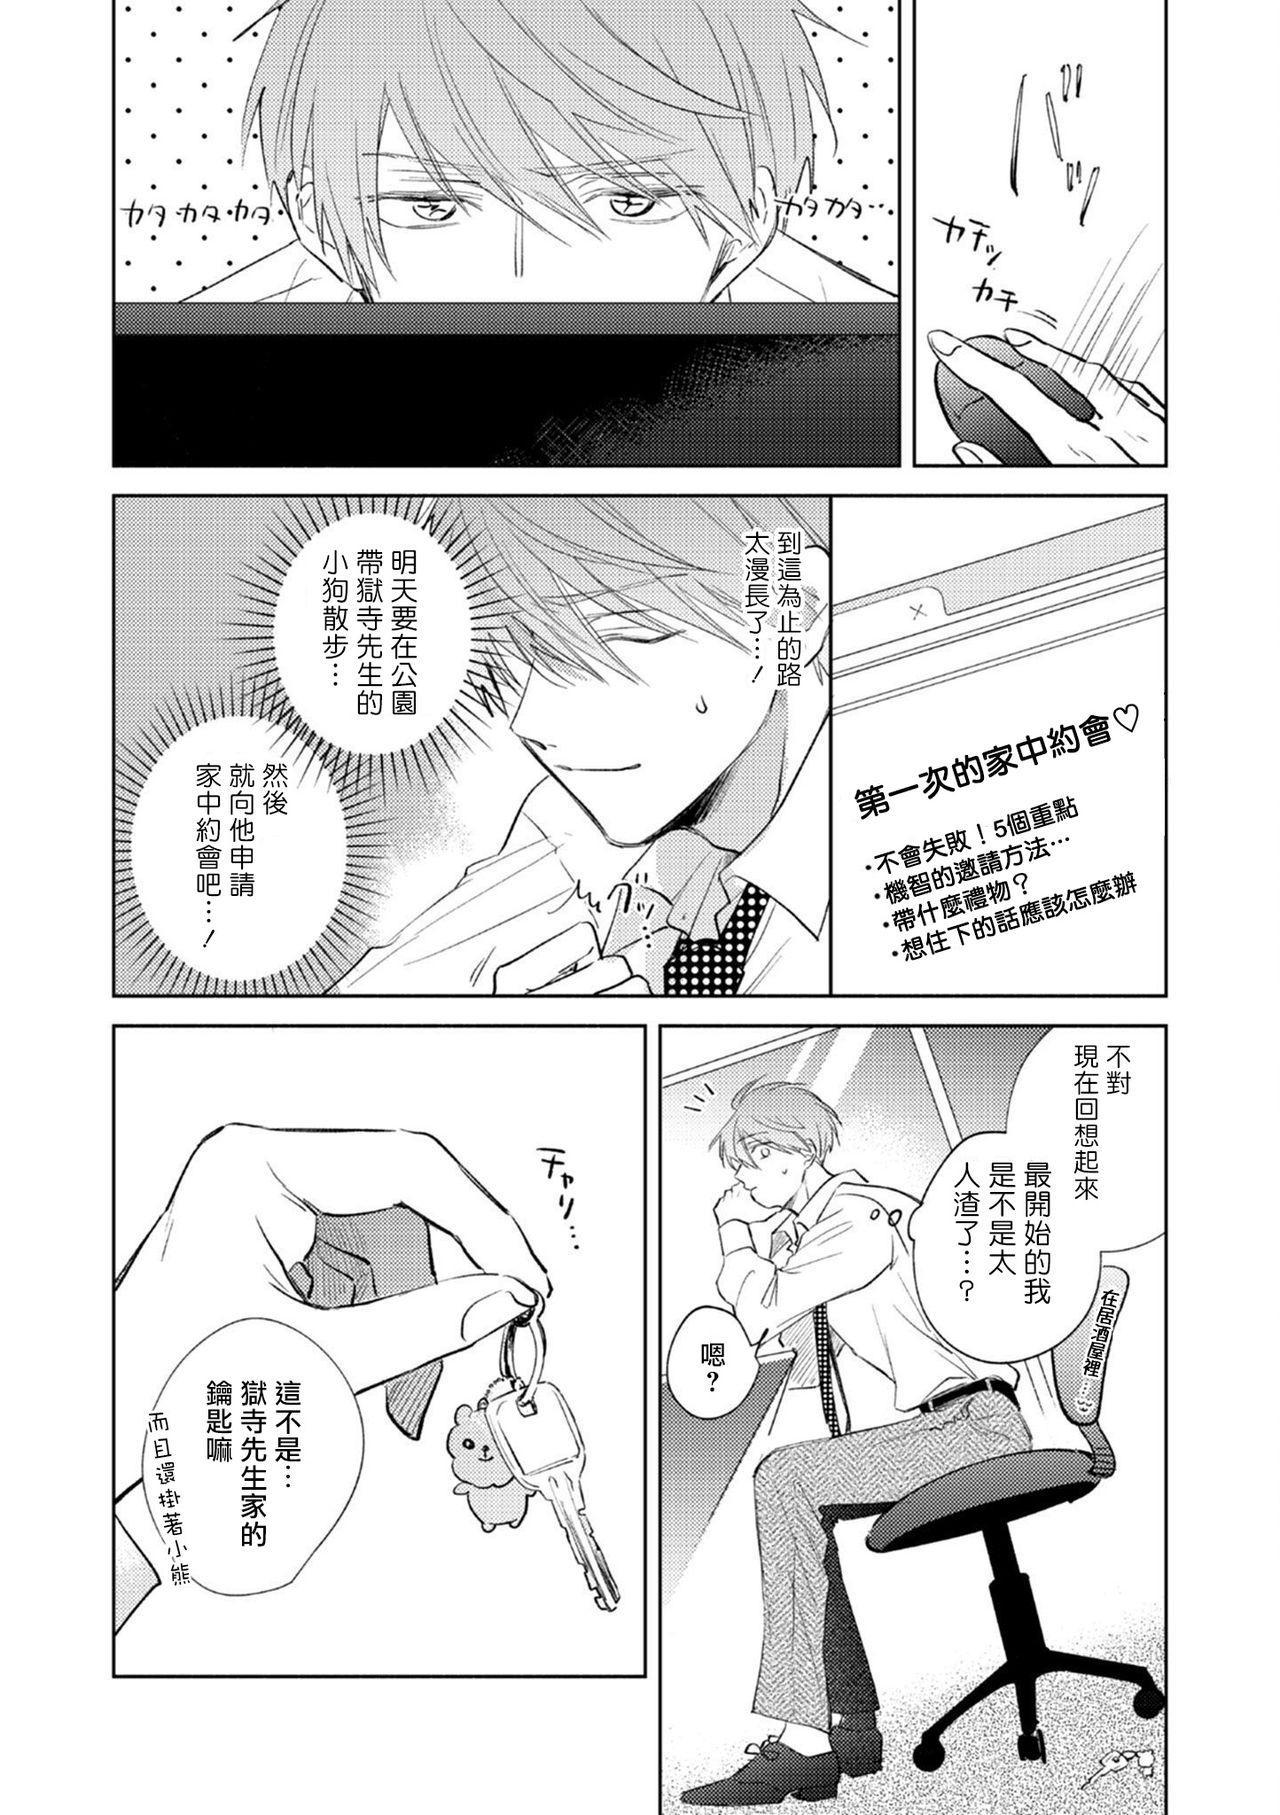 [Arata Licca] Oni Joushi Gokudera-san wa Abakaretai.   魔鬼上司·狱寺先生想暴露 Ch. 1-6+番外 [Chinese] [拾荒者汉化组] [Digital] 88